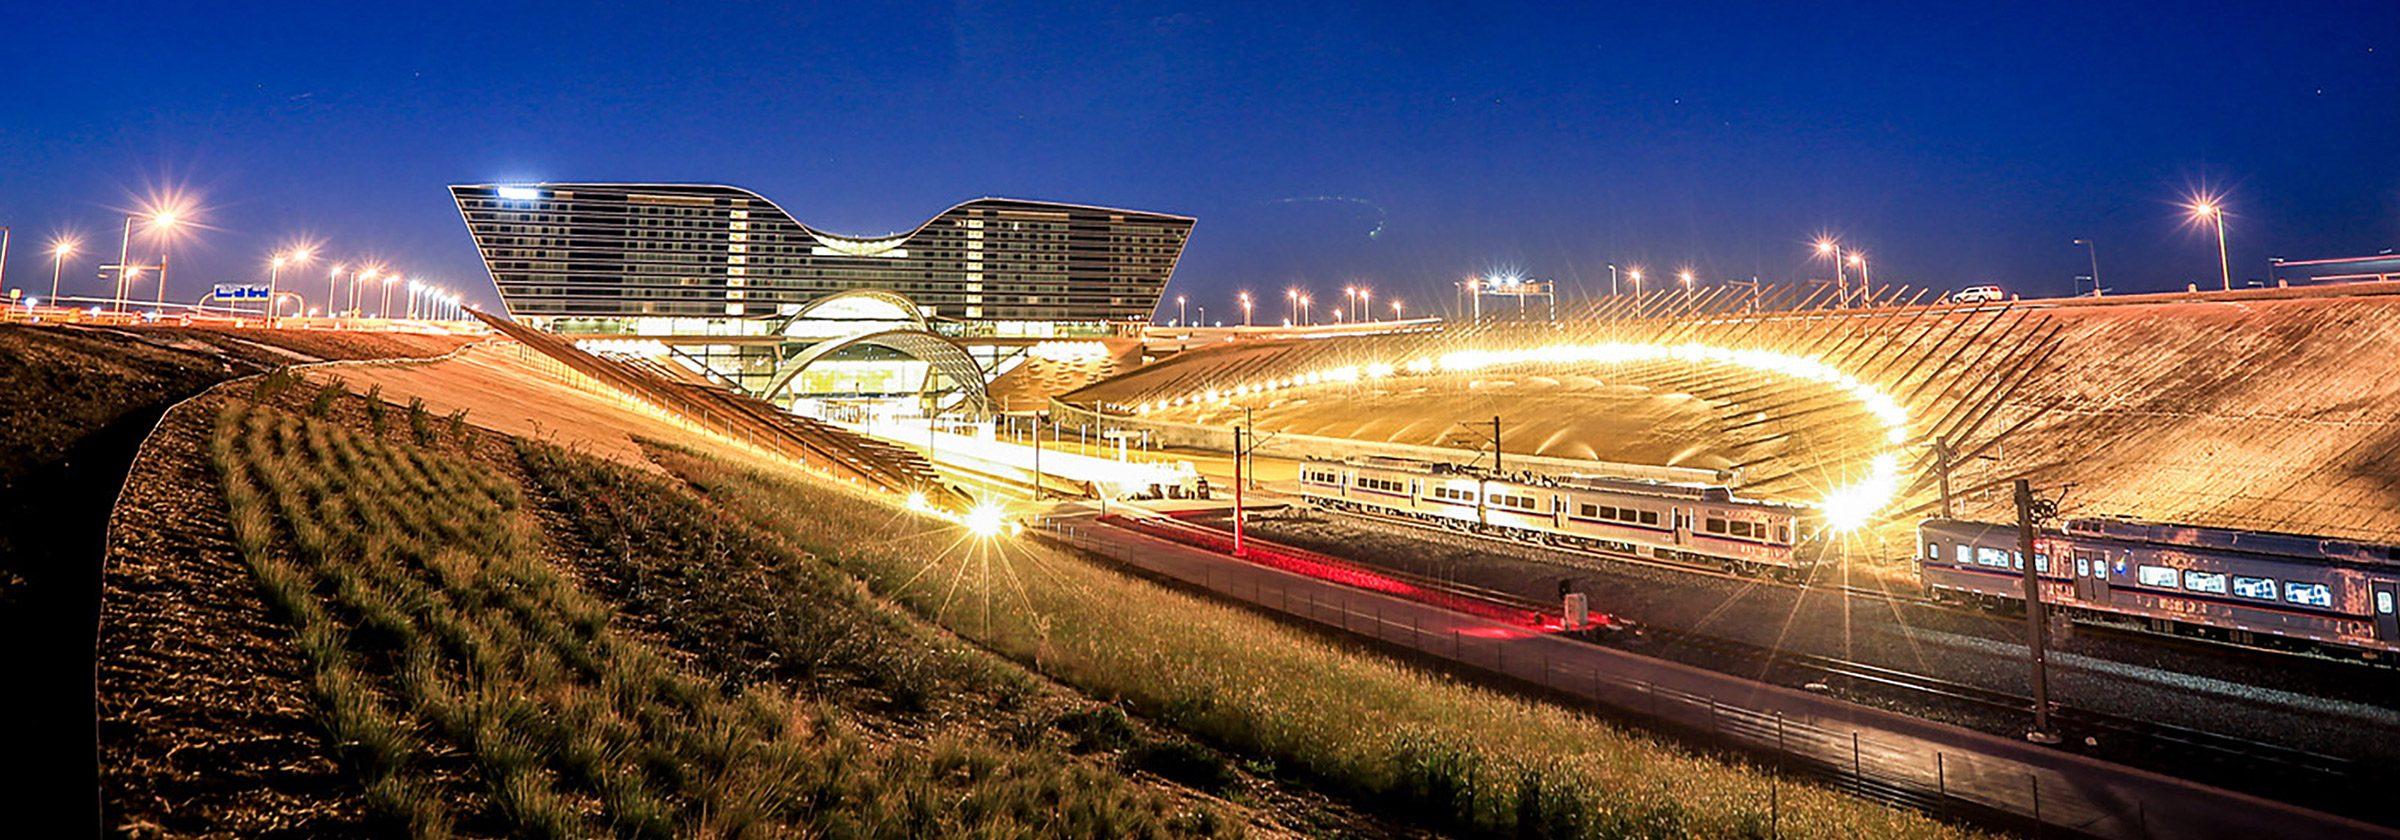 denver international airport hotel amp transit center